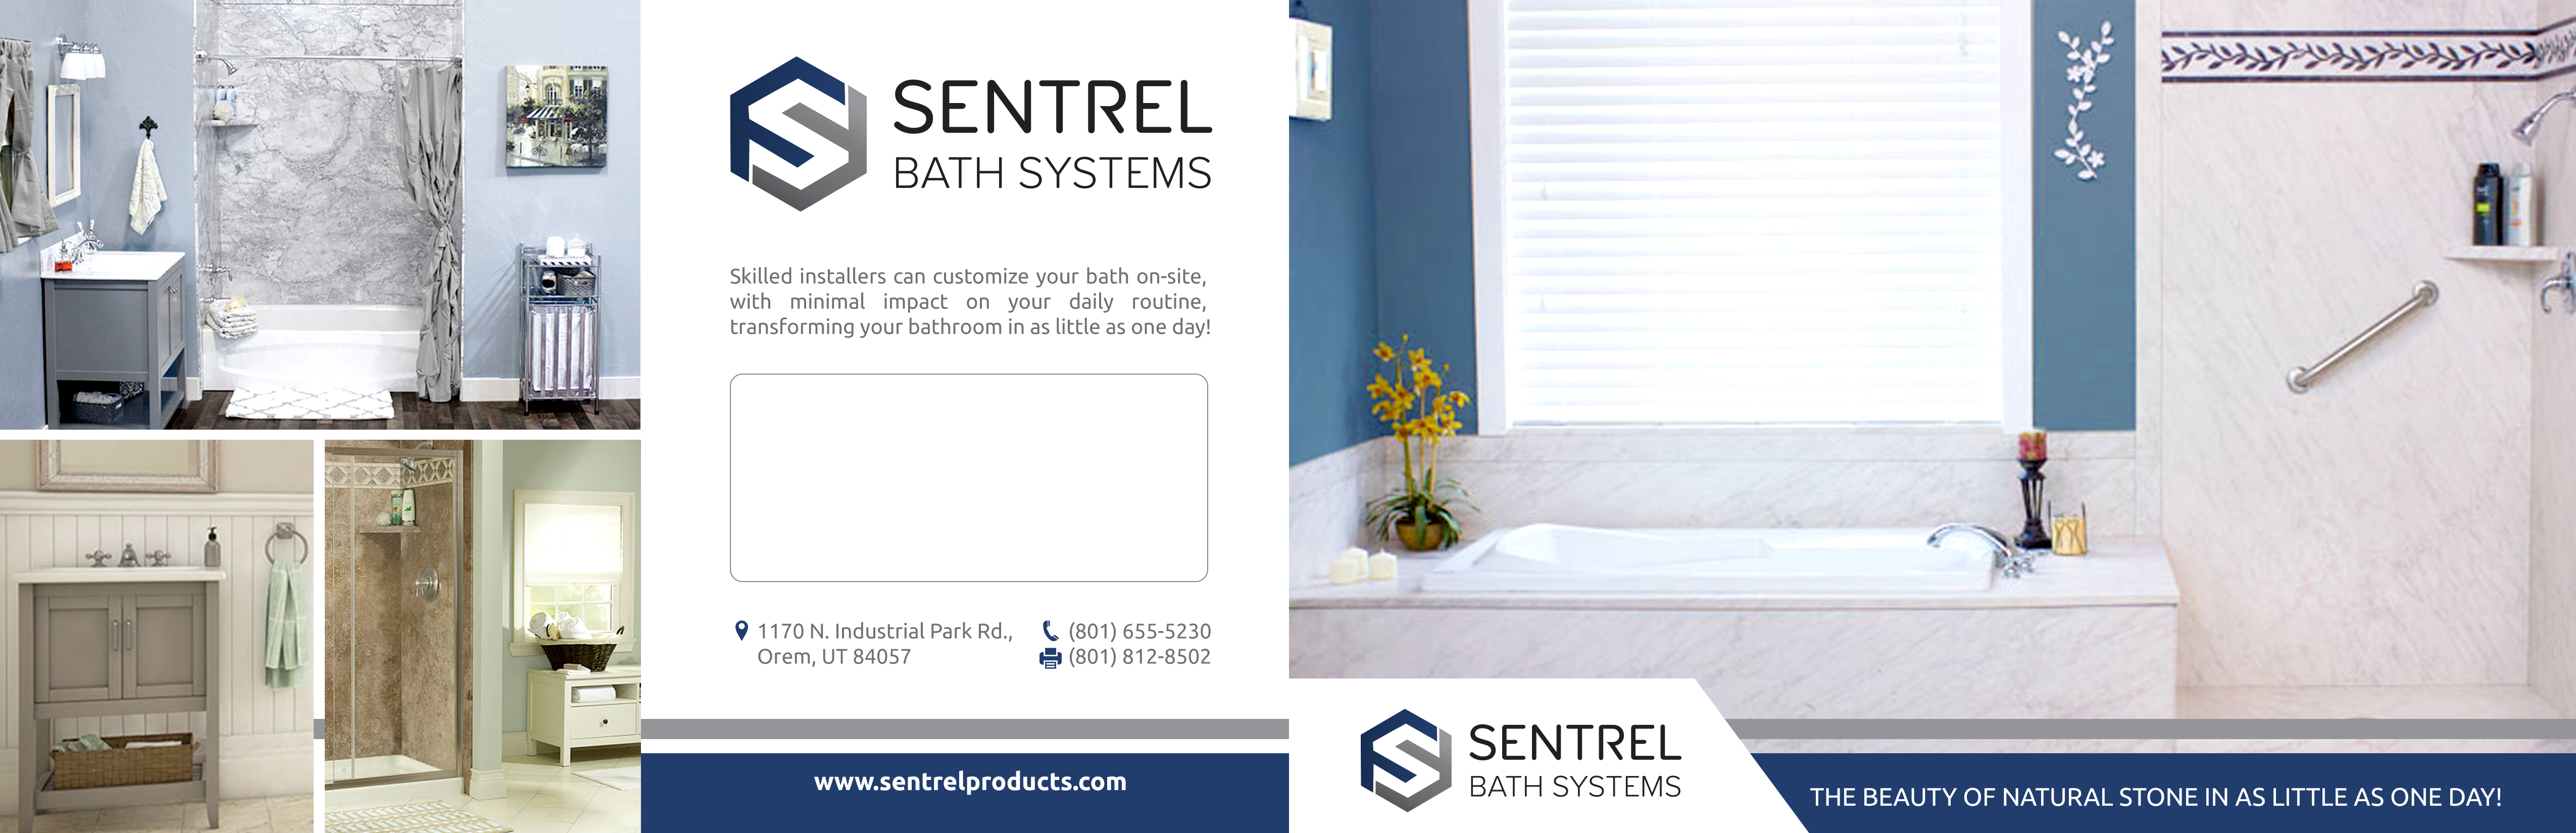 Sentrel Bath Systems Consumer Brochure